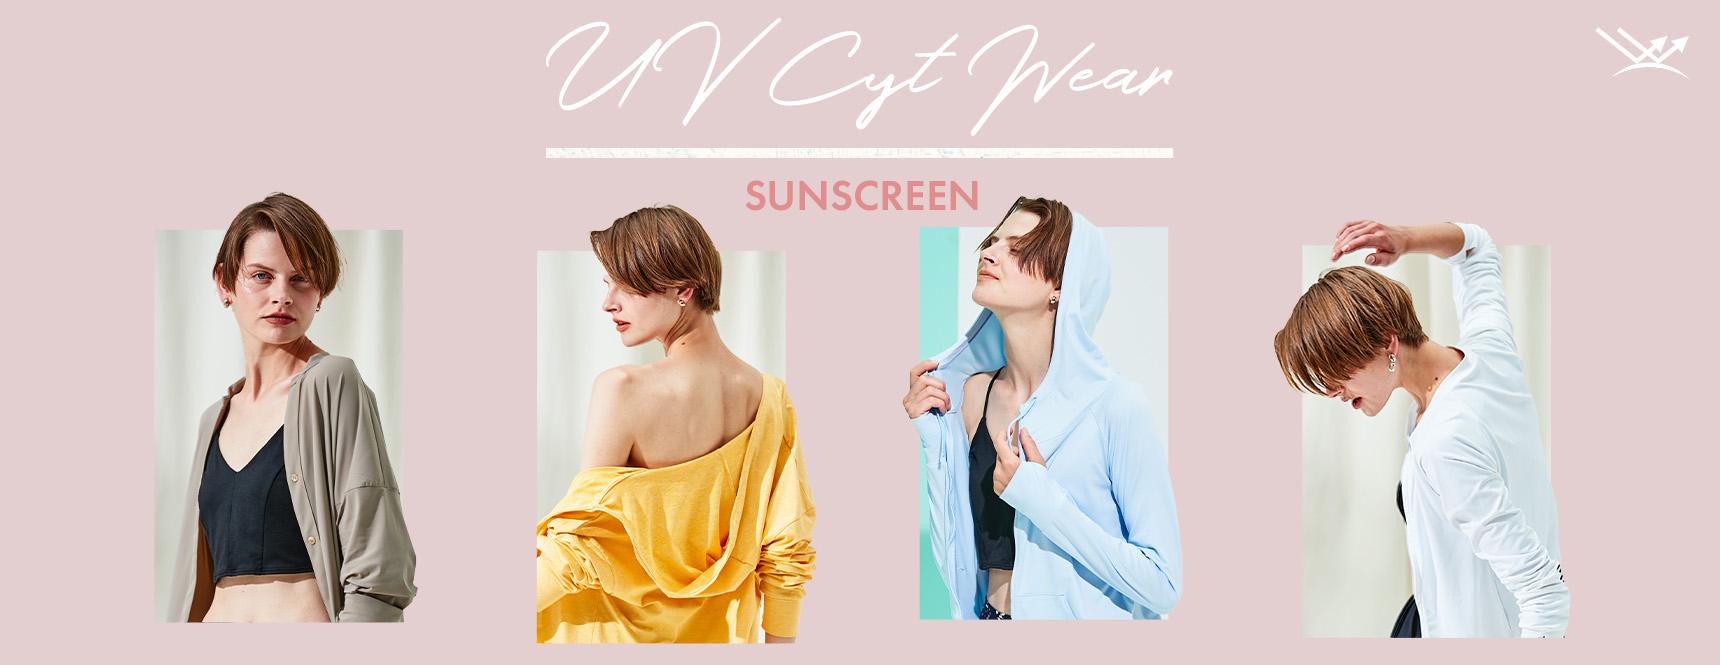 UV CUT WEAR